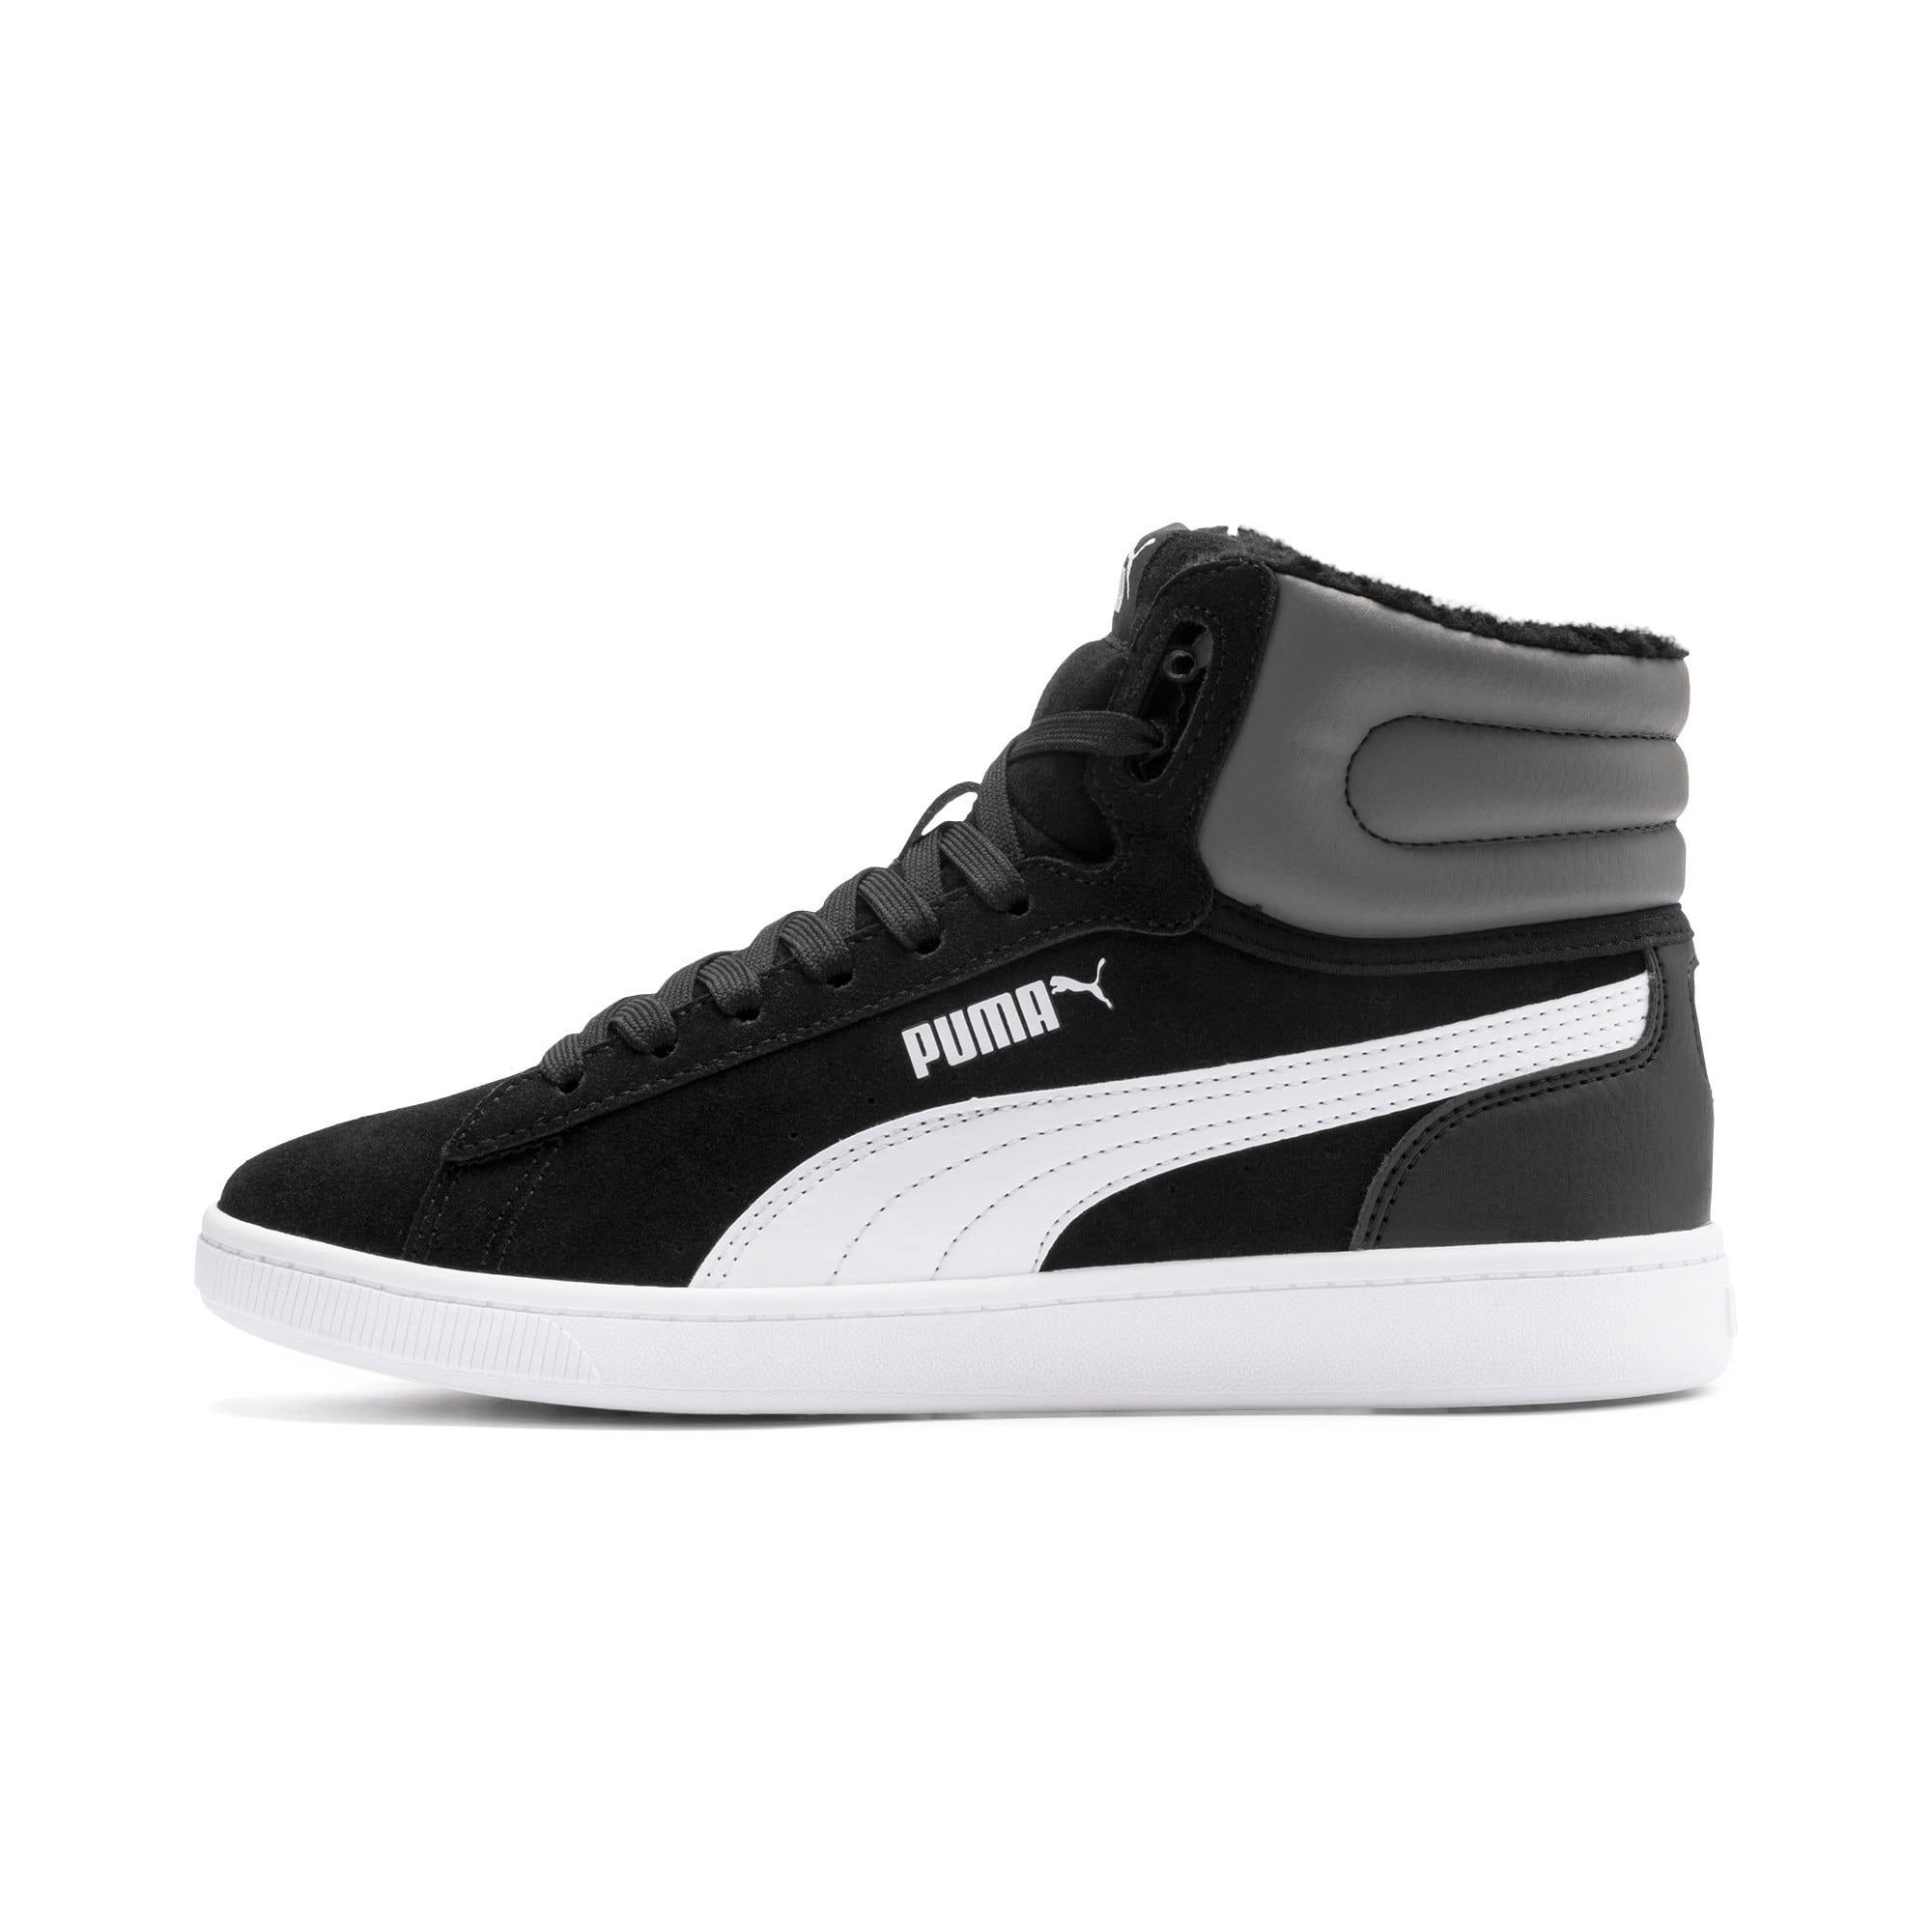 Thumbnail 1 of Vikky v2 Mid Fur Youth Mädchen Sneaker, Puma Black-CASTLEROCK-White, medium